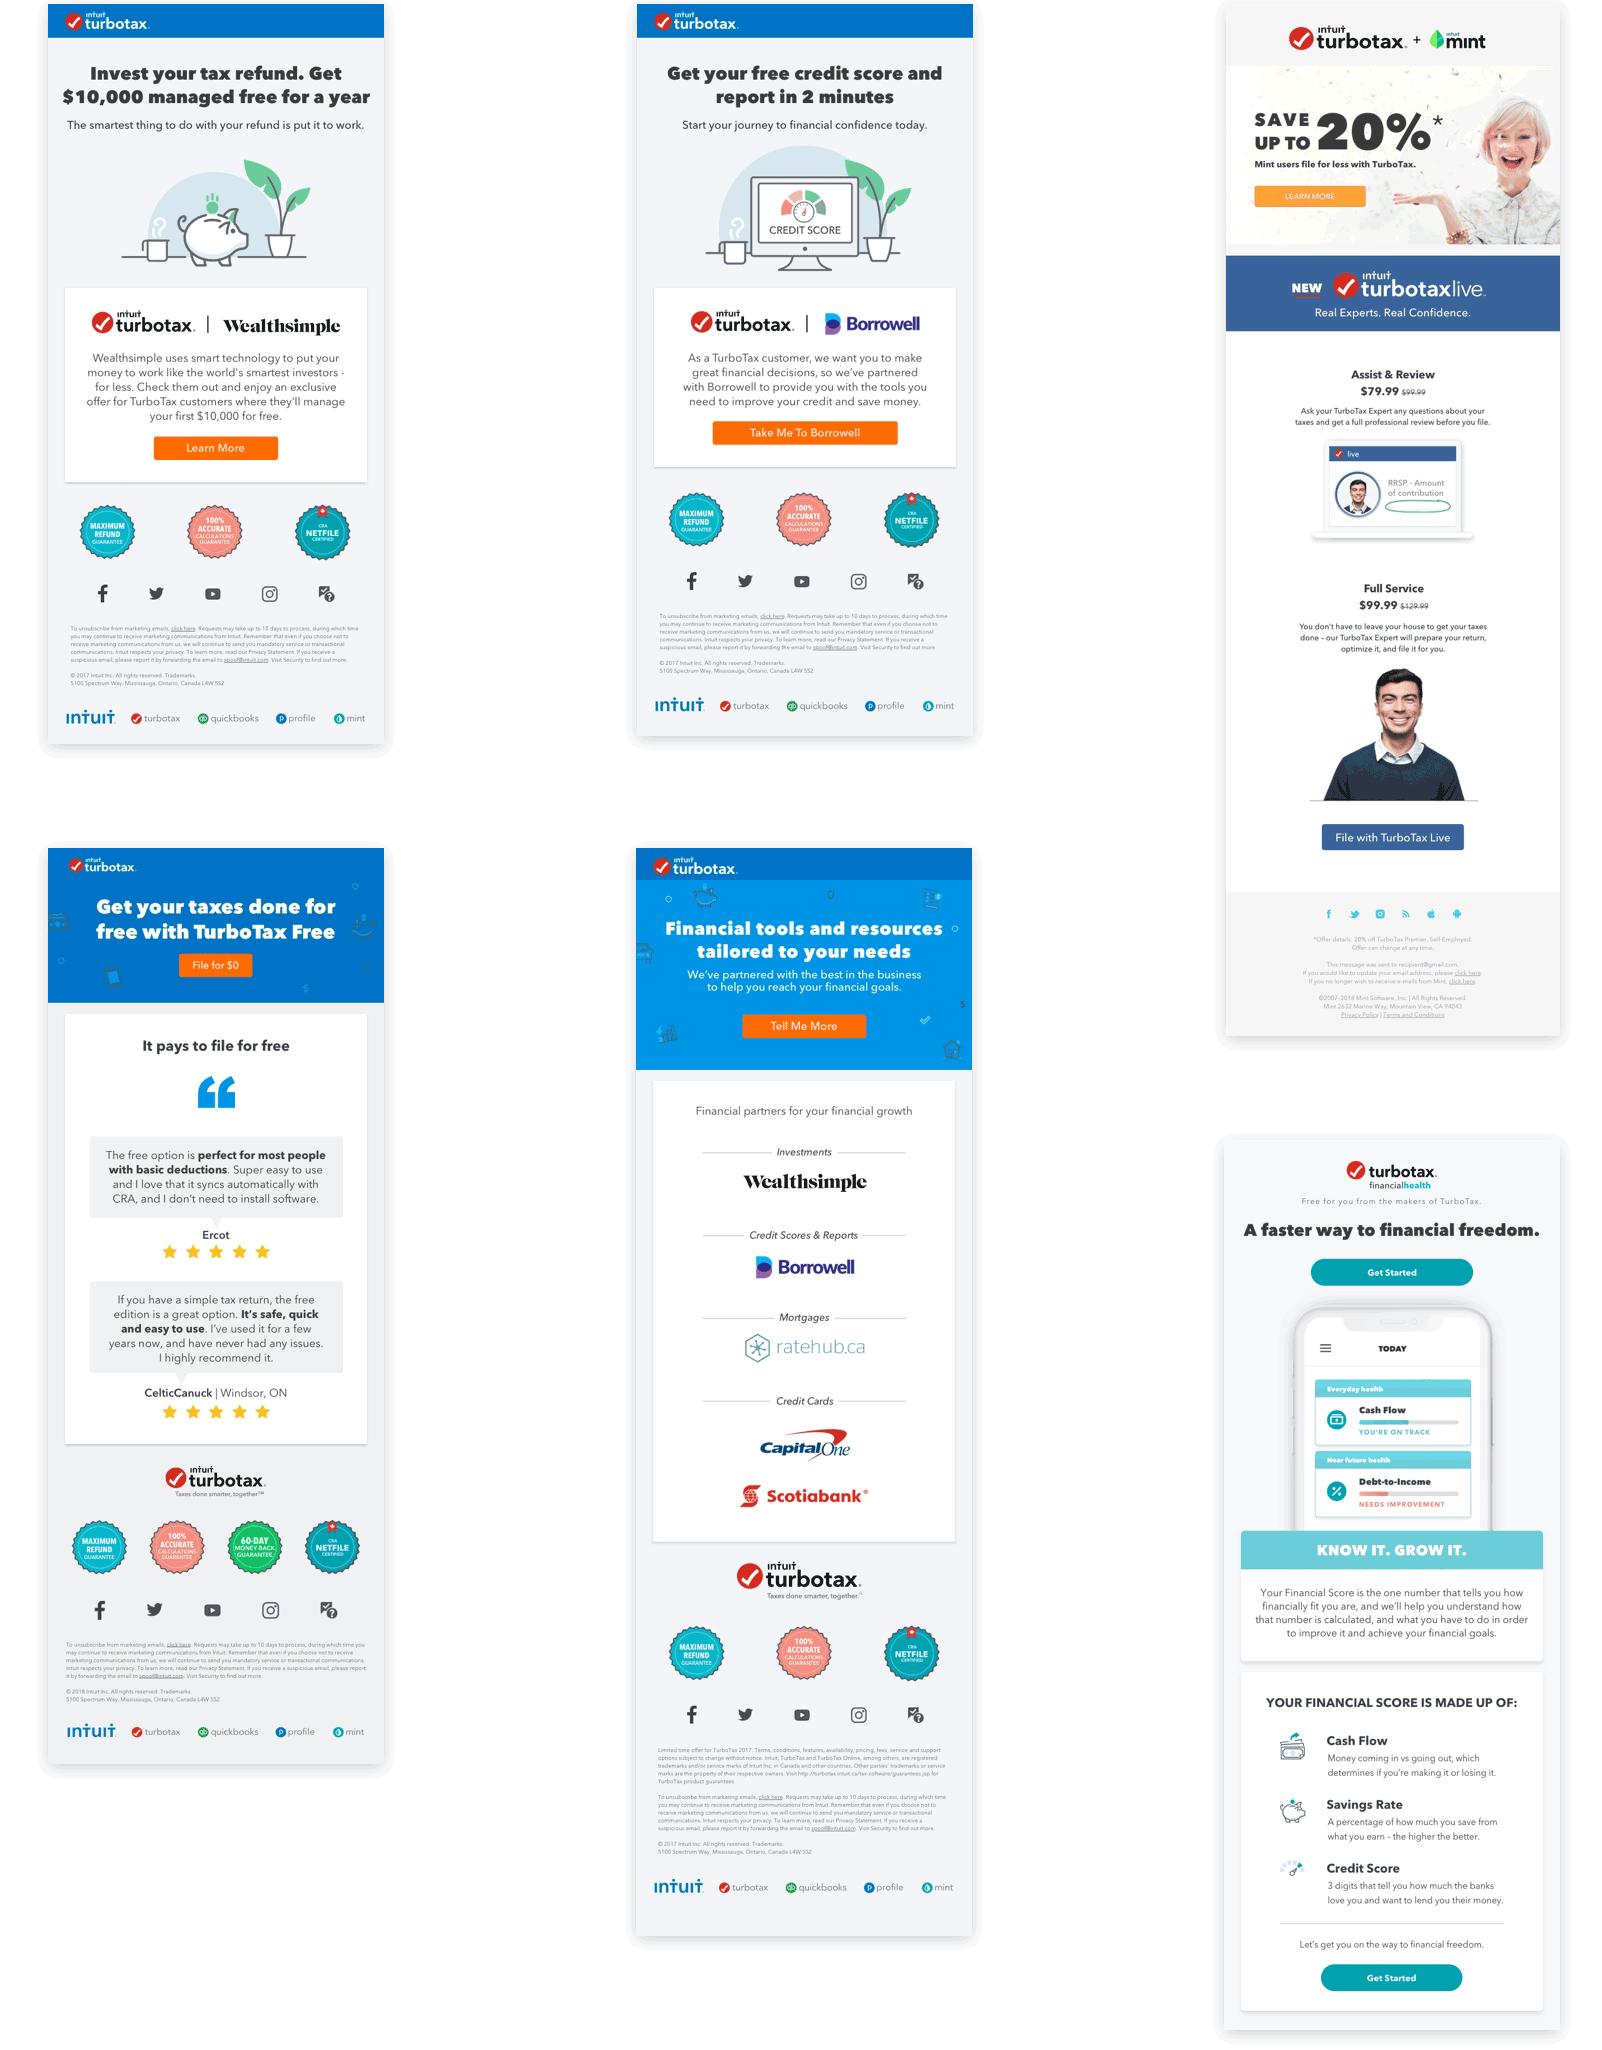 TurboTax_Email-Design